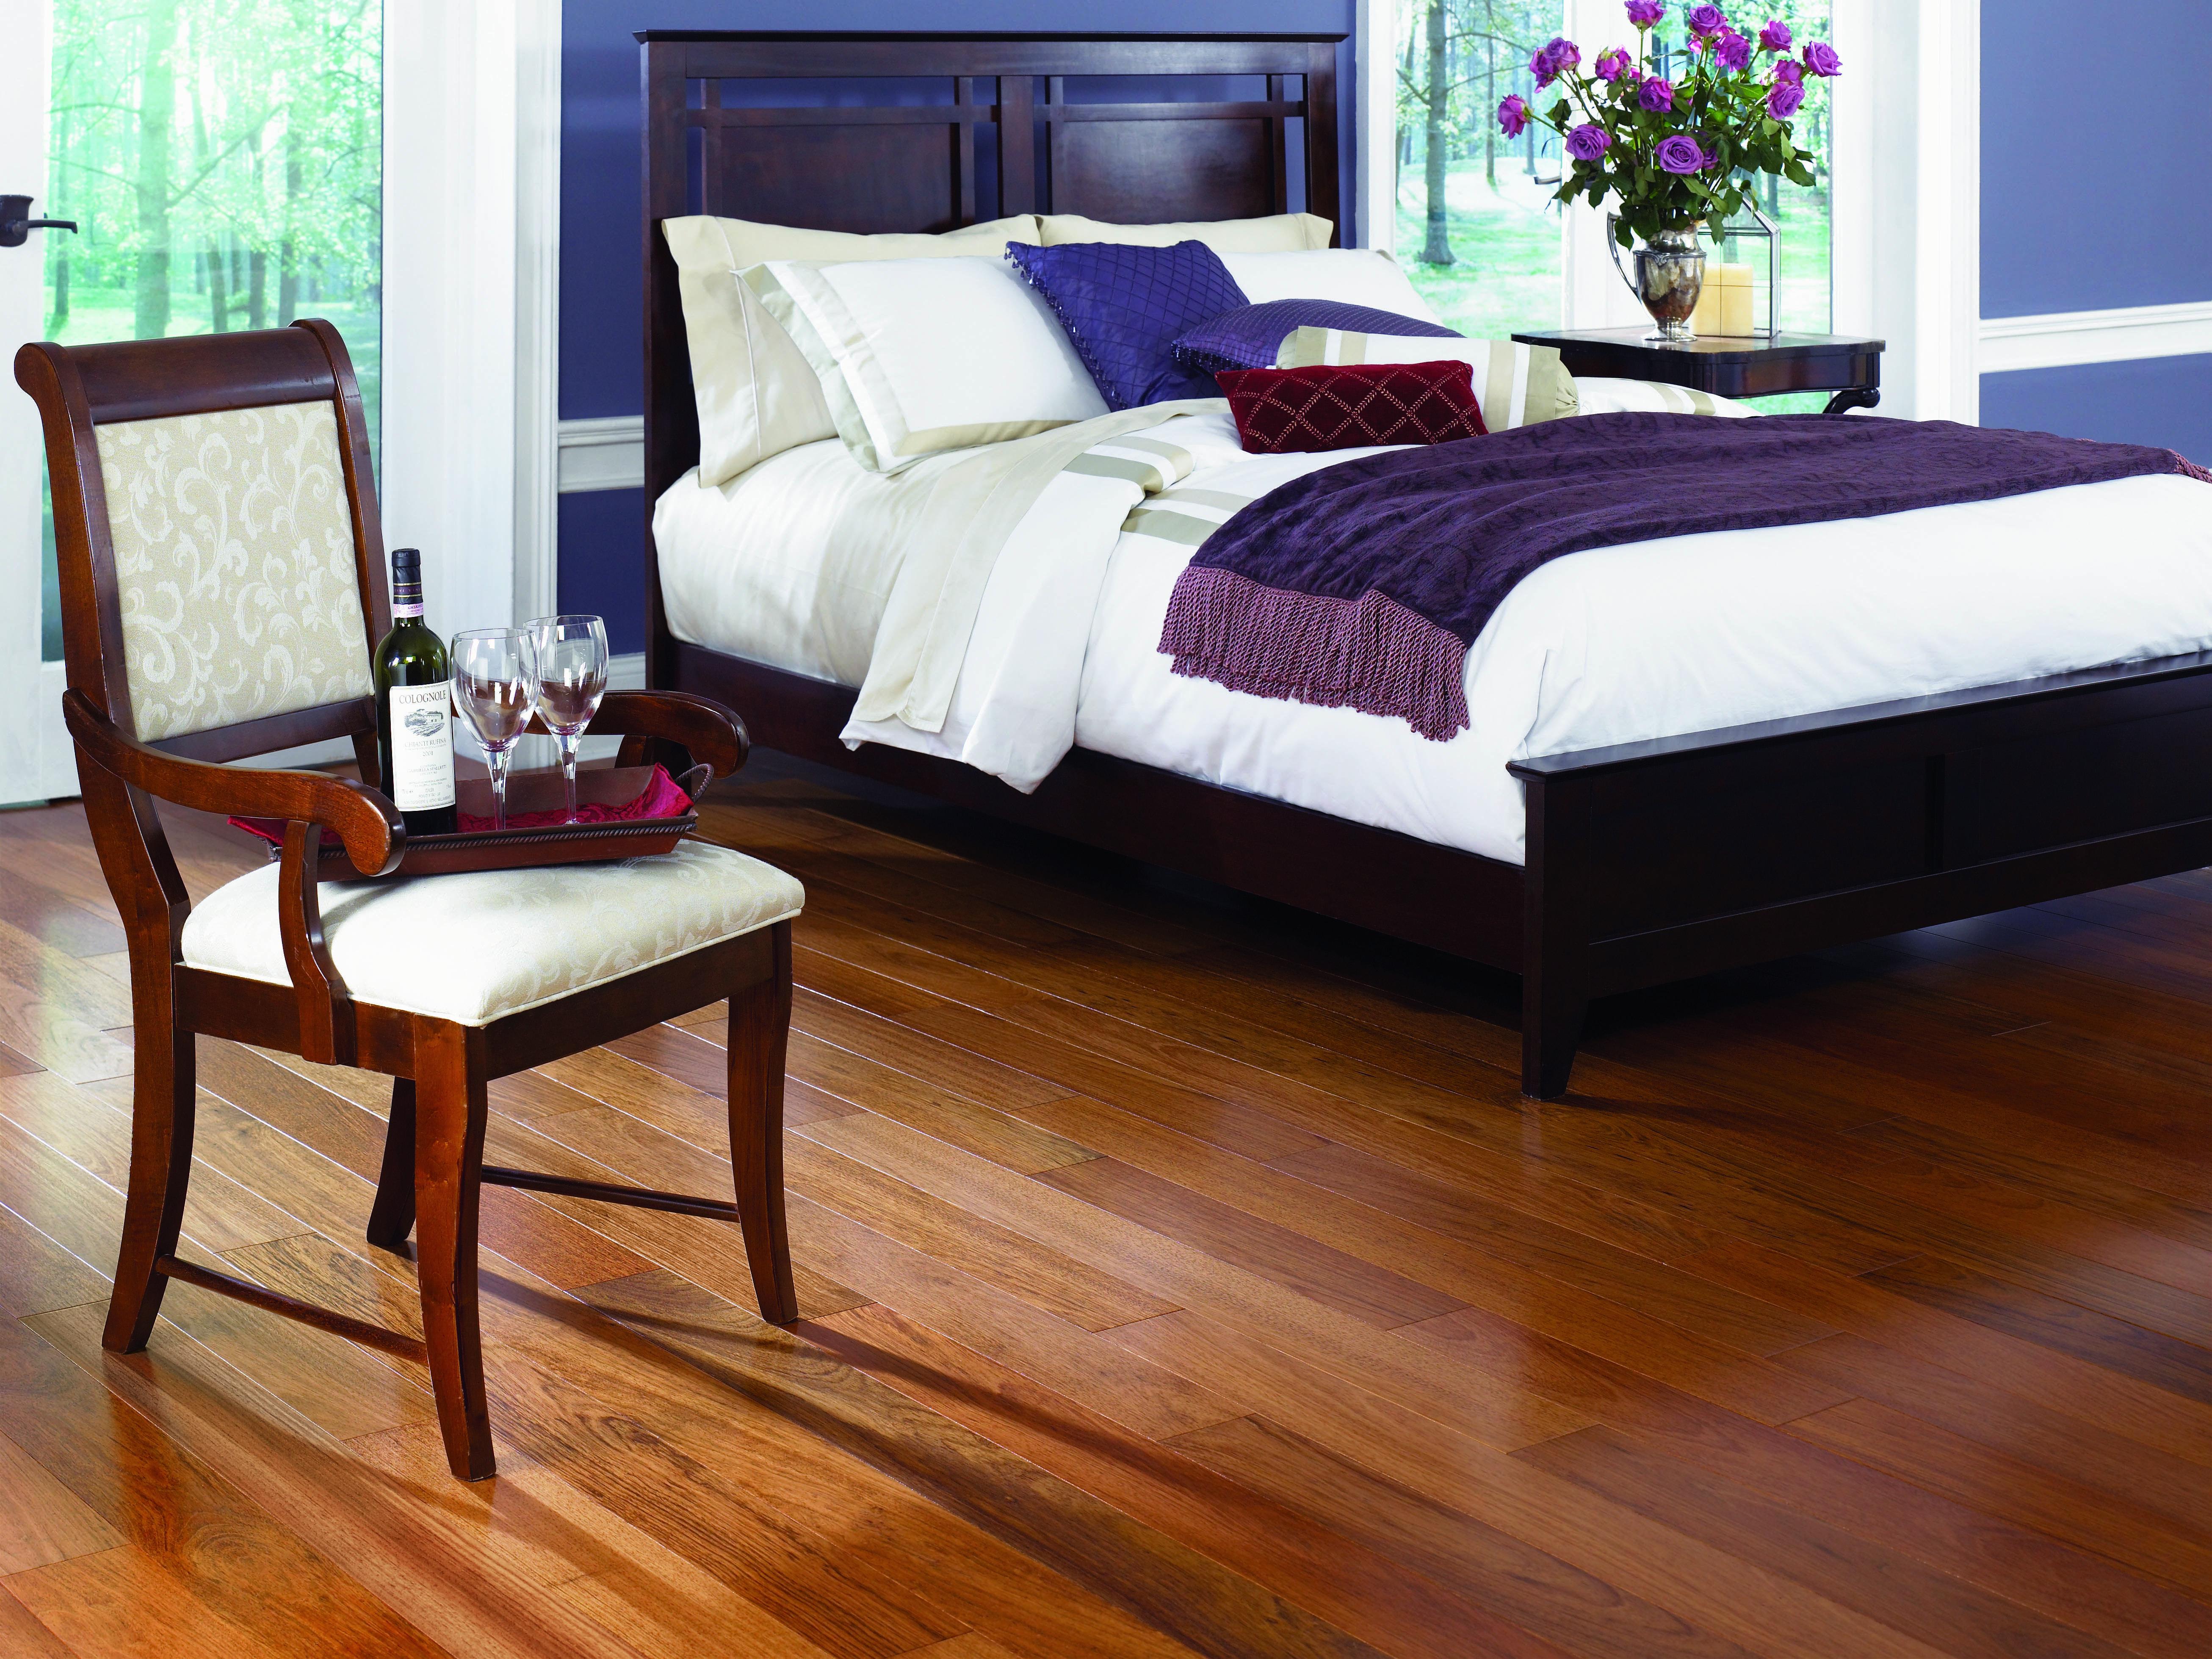 Prefinished Brazilian Cherry Hardwood Style, durability